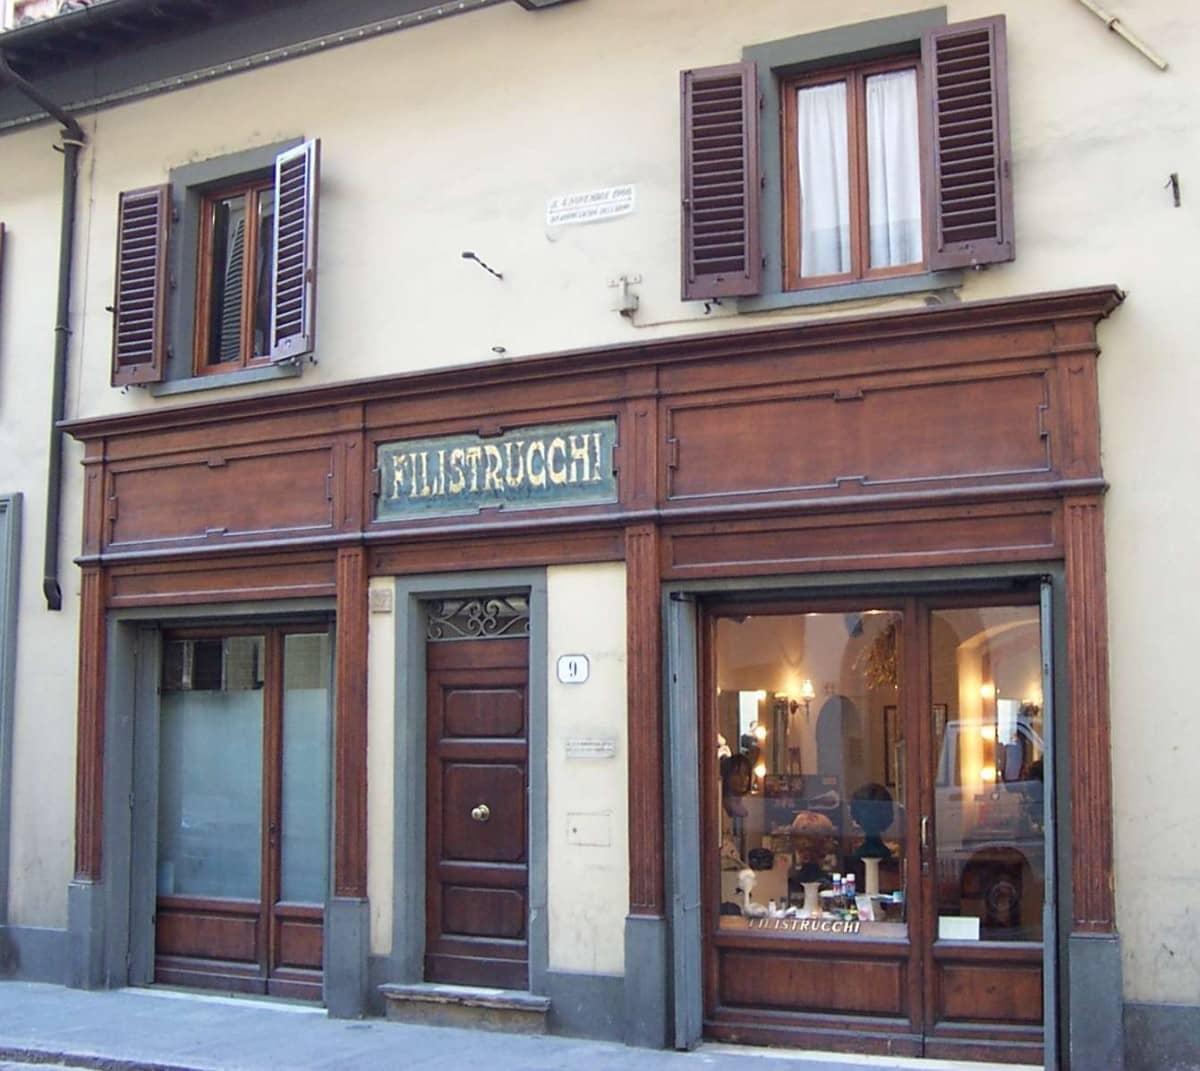 filistrucchi-parruccai-firenze-thumbnail